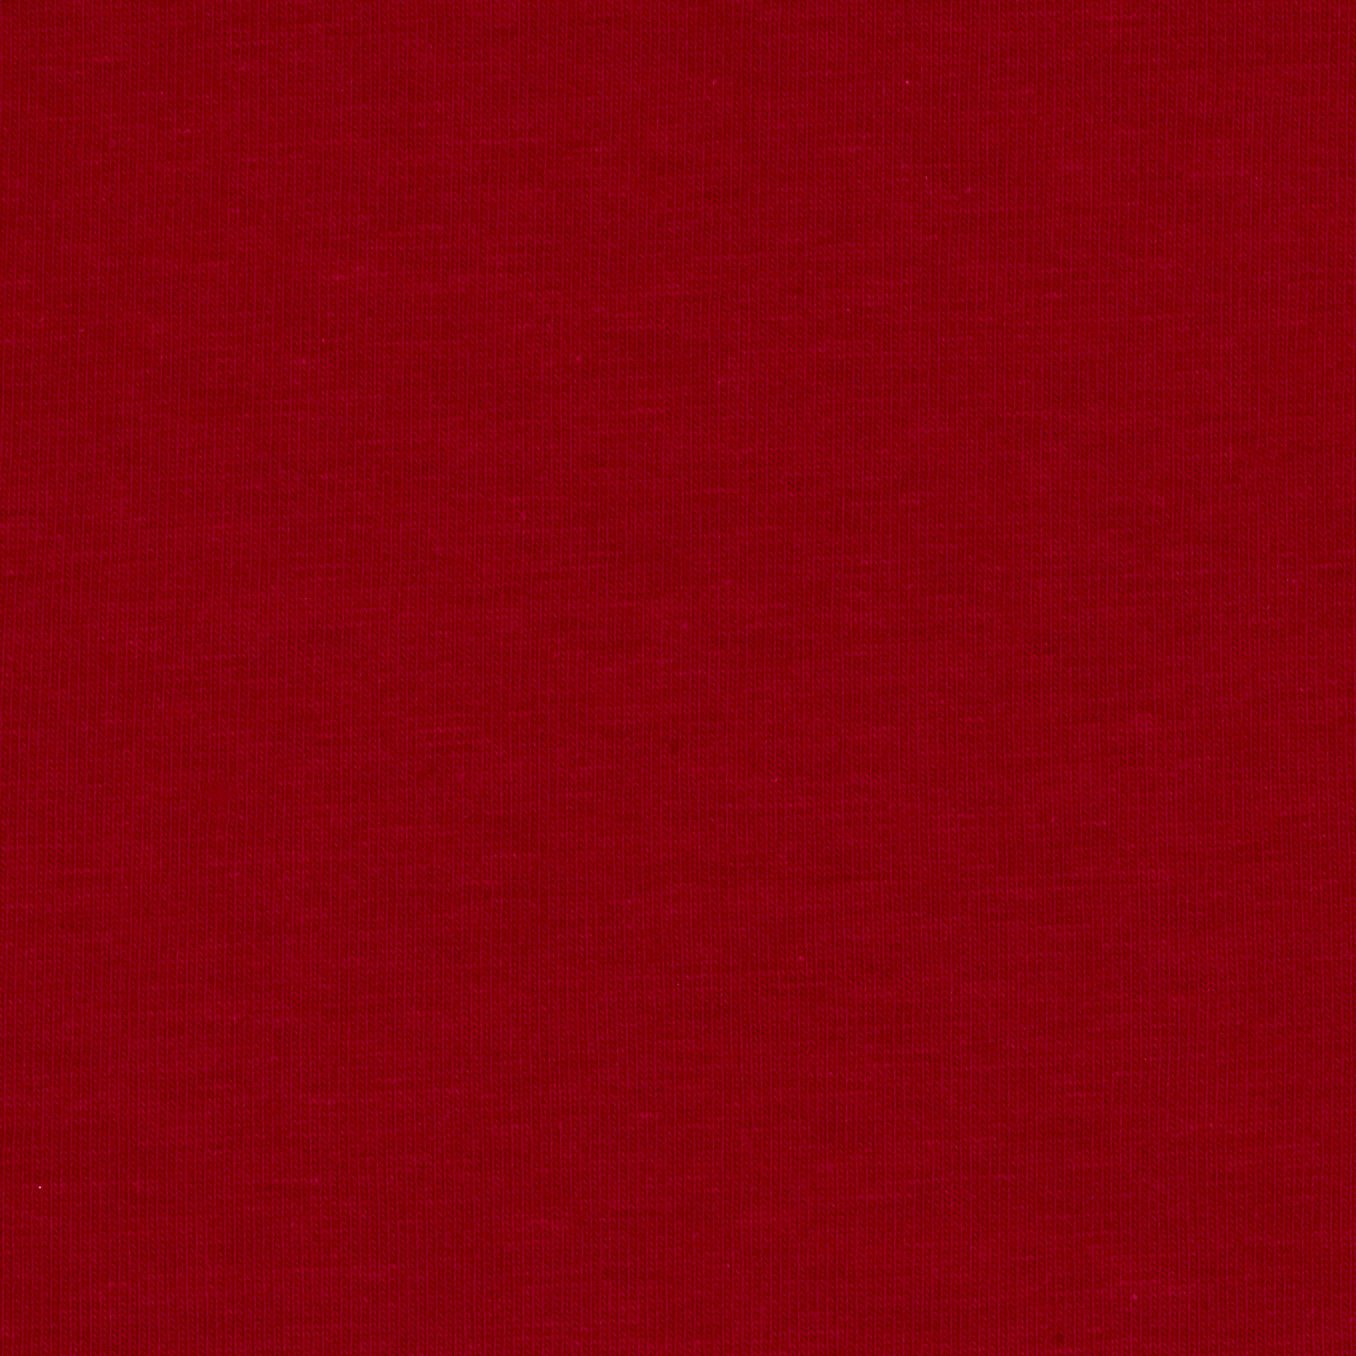 Amazon Com Robert Kaufman Laguna Stretch Cotton Jersey Knit Fabric